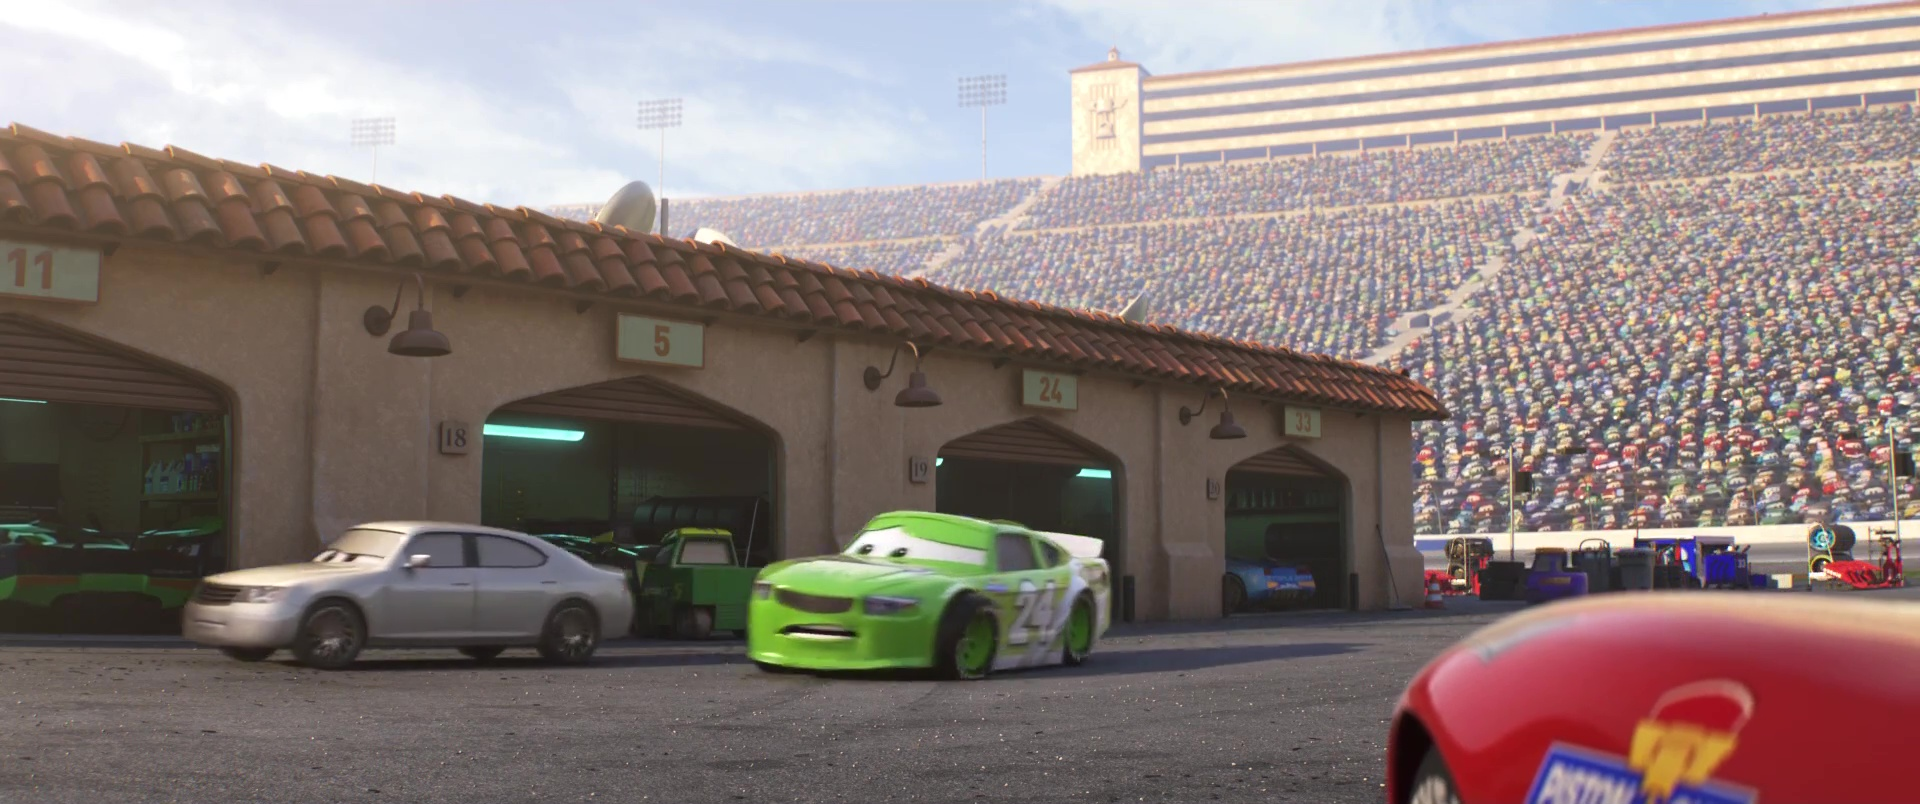 brick yardley personnage character disney pixar cars 3